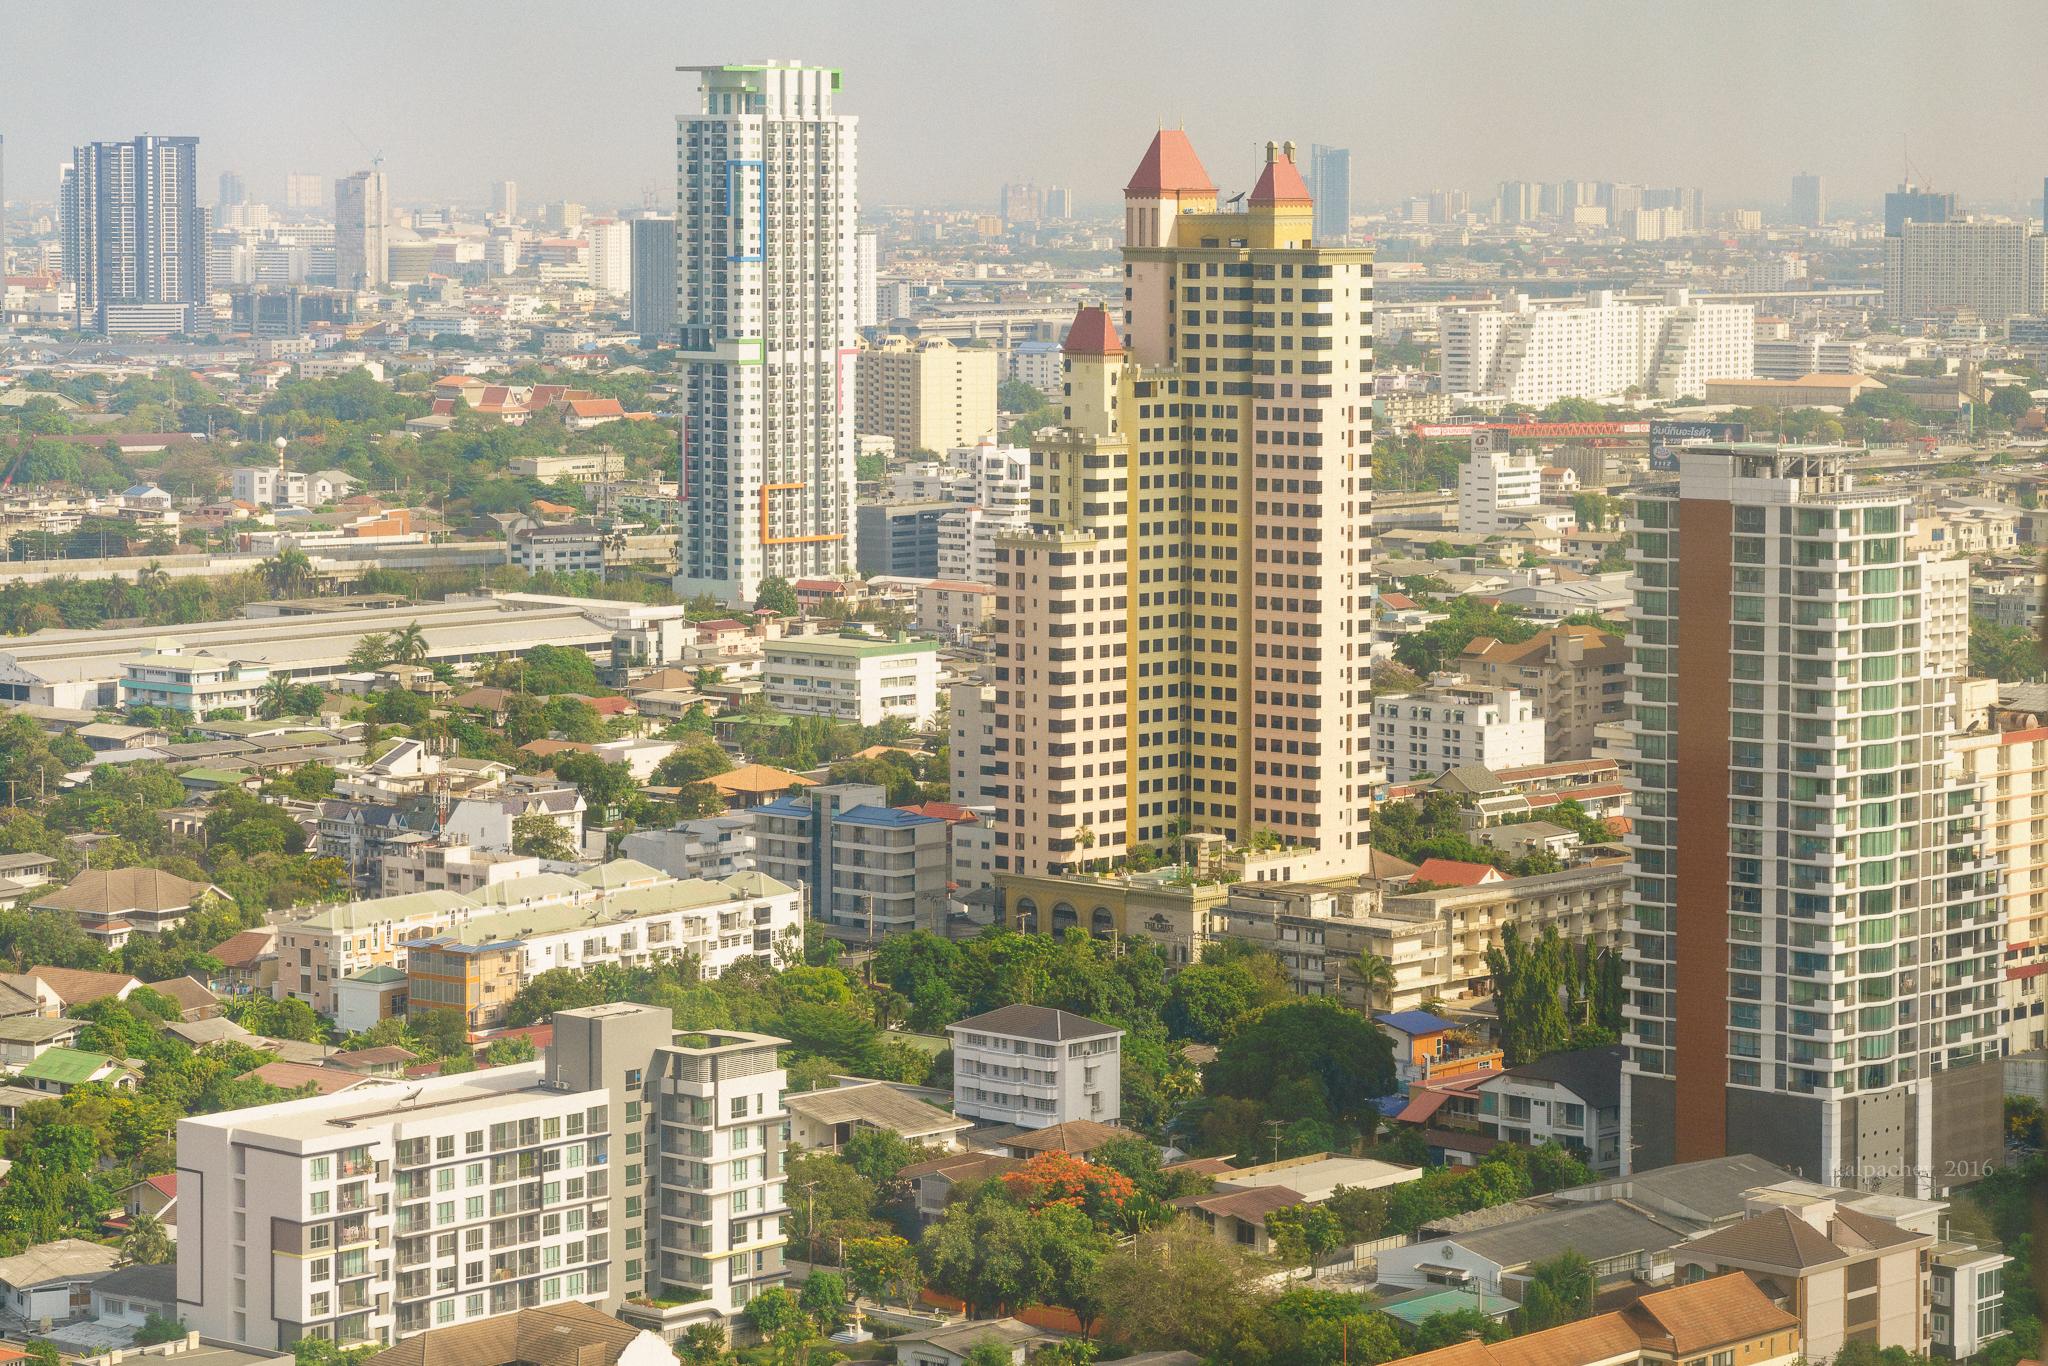 Thailand May 2016 Full photos